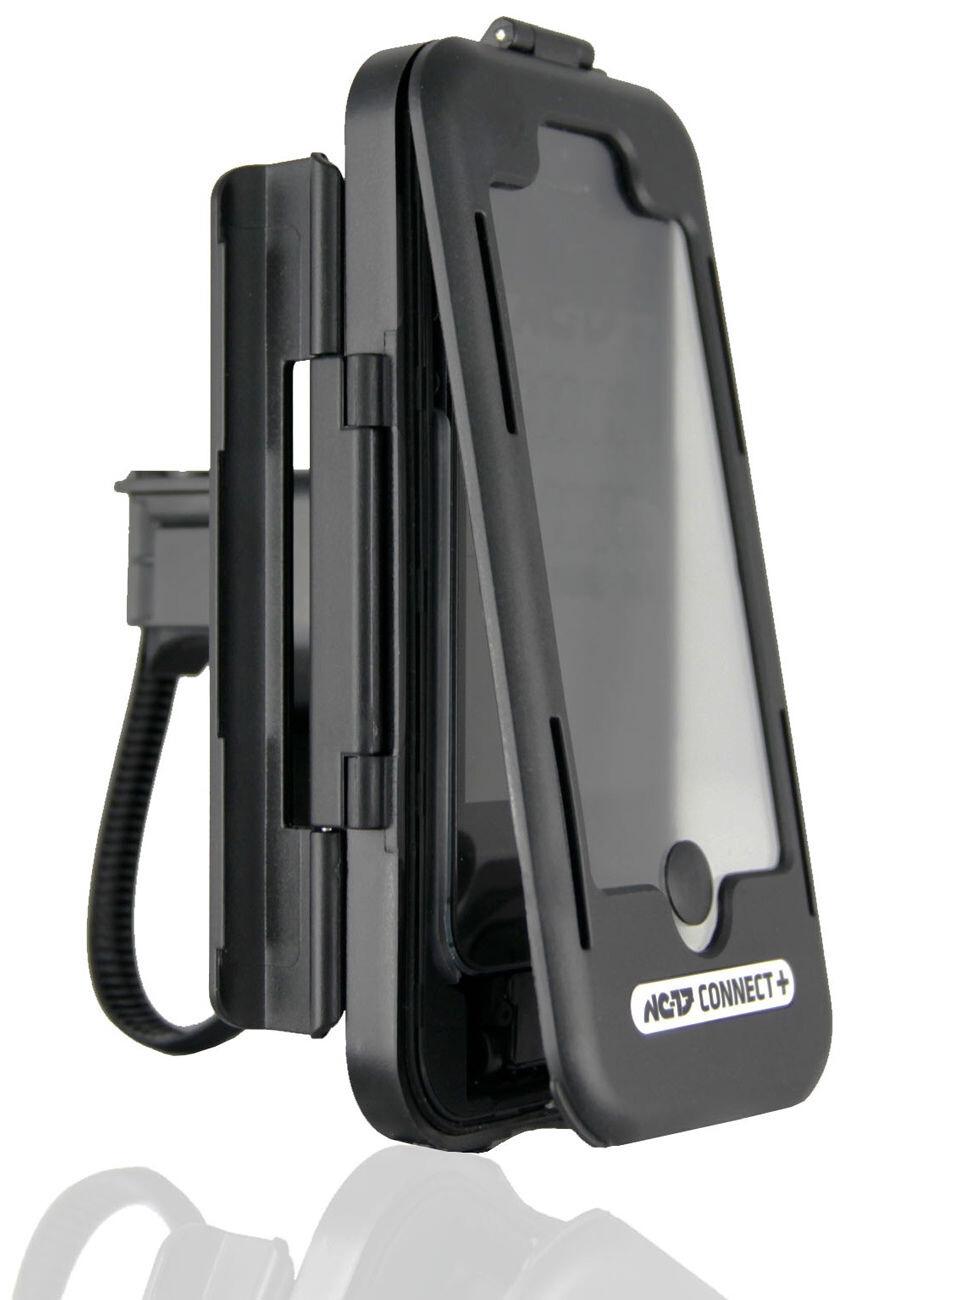 nc 17 connect iphone fahrradhalterung mit ladefunktion. Black Bedroom Furniture Sets. Home Design Ideas